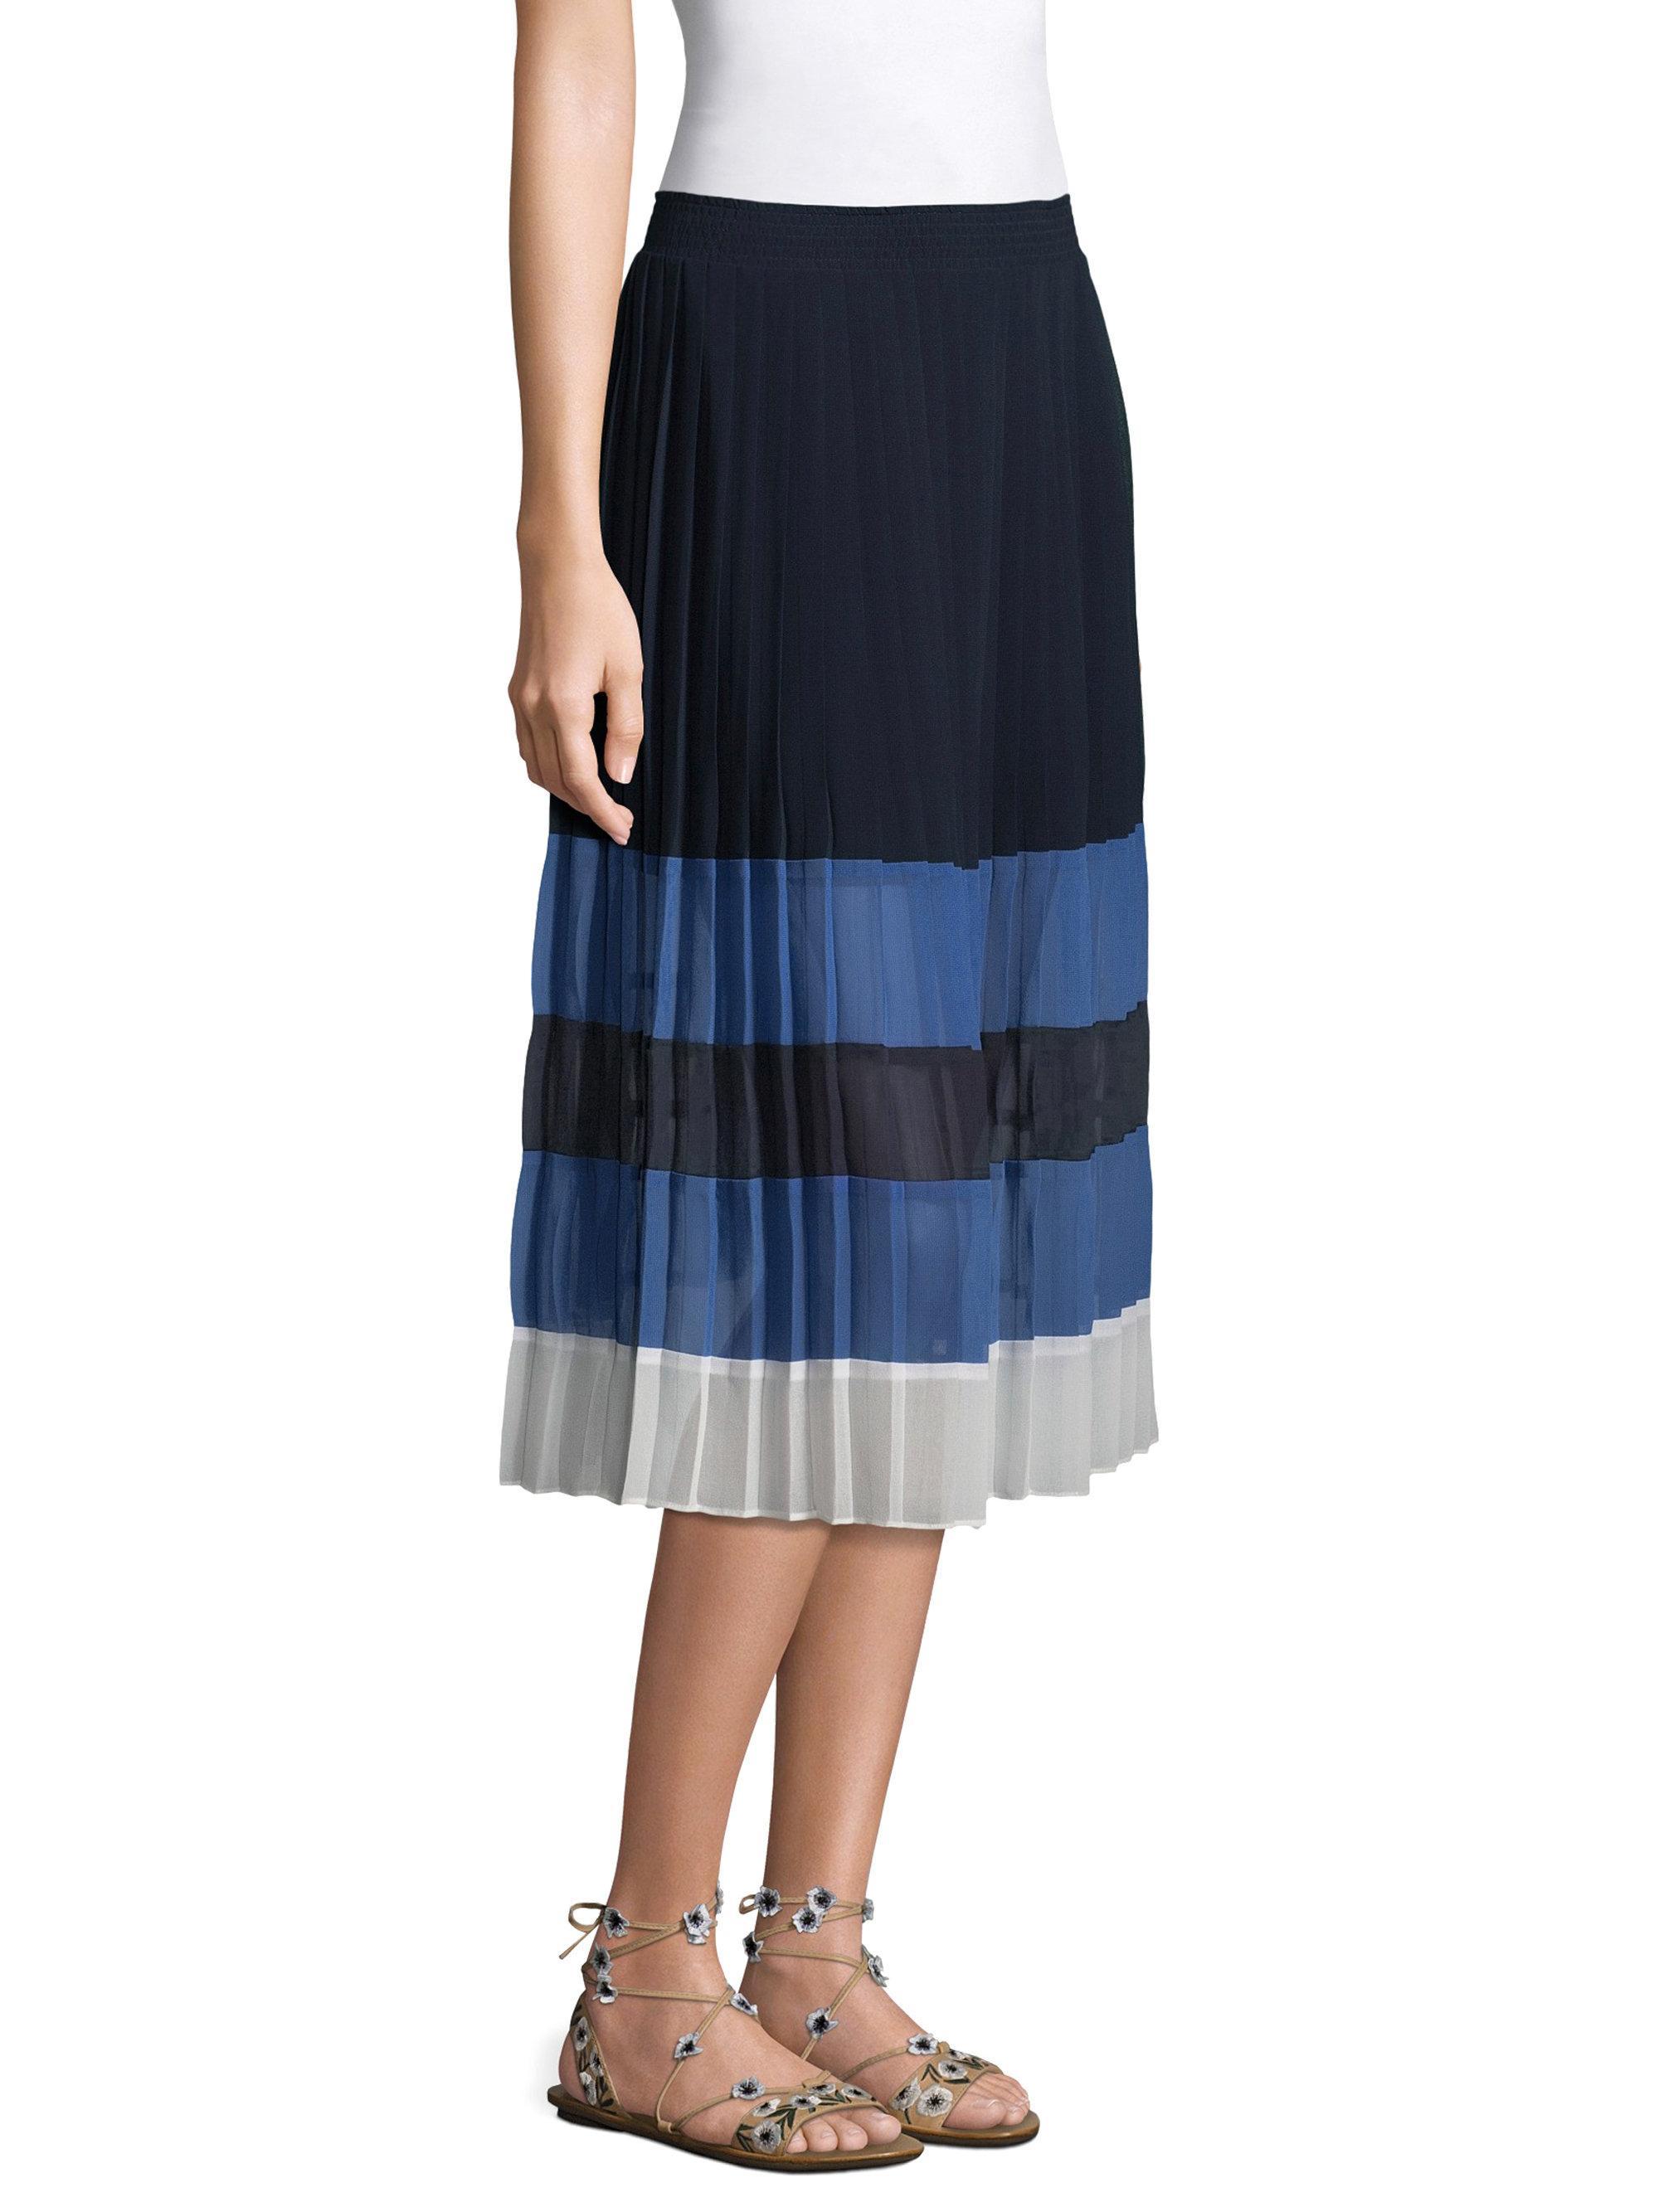 3ad6f0541 Joie Alpons Pleated Colorblock Midi Skirt in Blue - Lyst